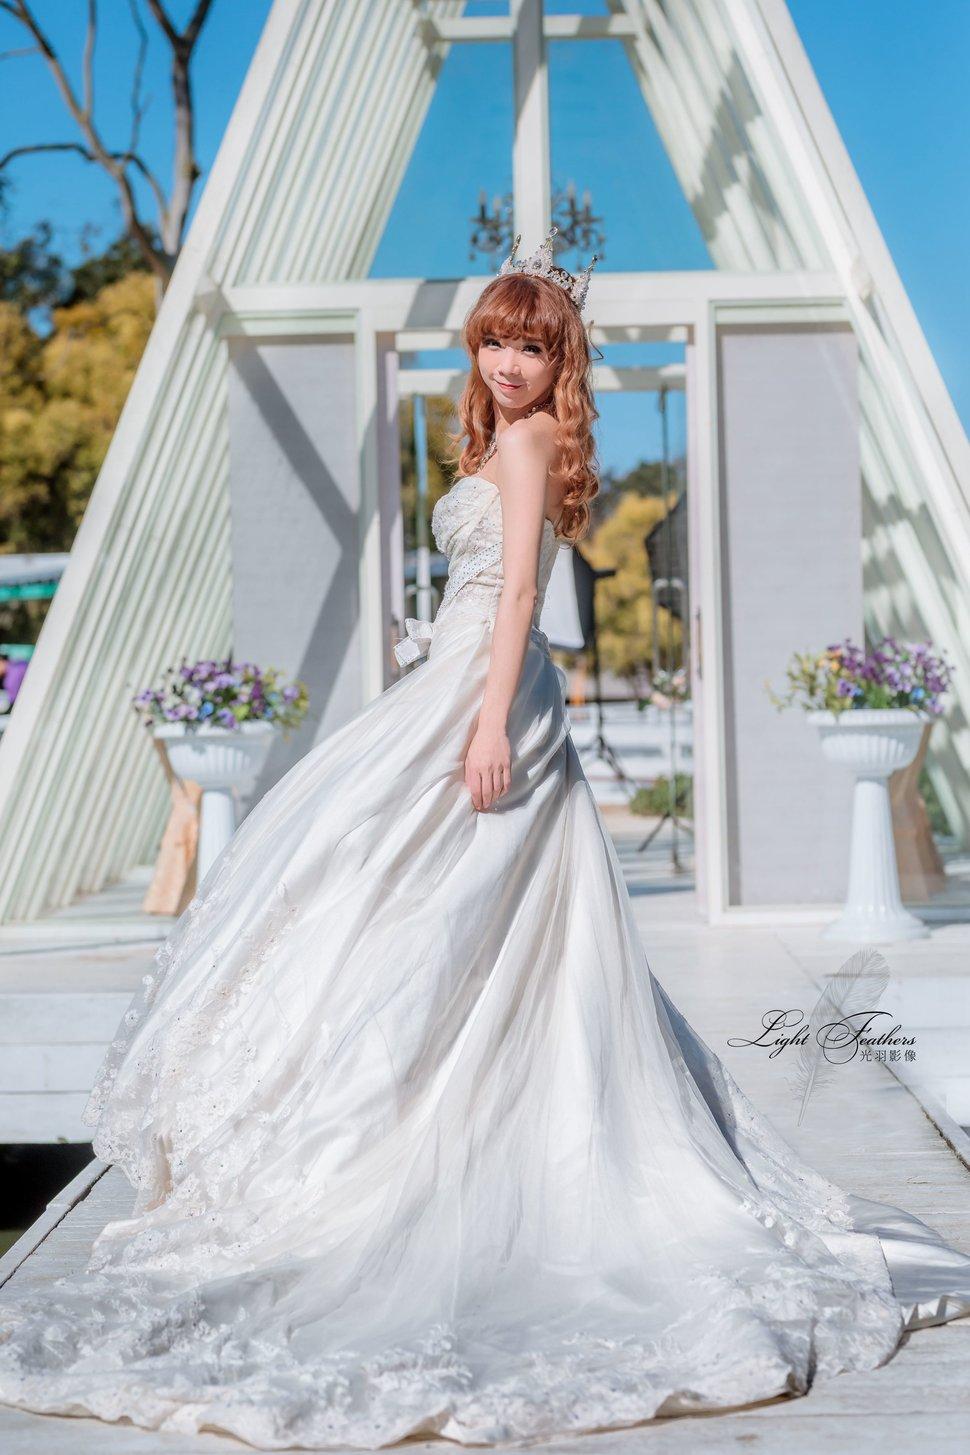 5D4_1807_副本 - Promaker婚禮紀錄攝影團隊婚攝豪哥《結婚吧》